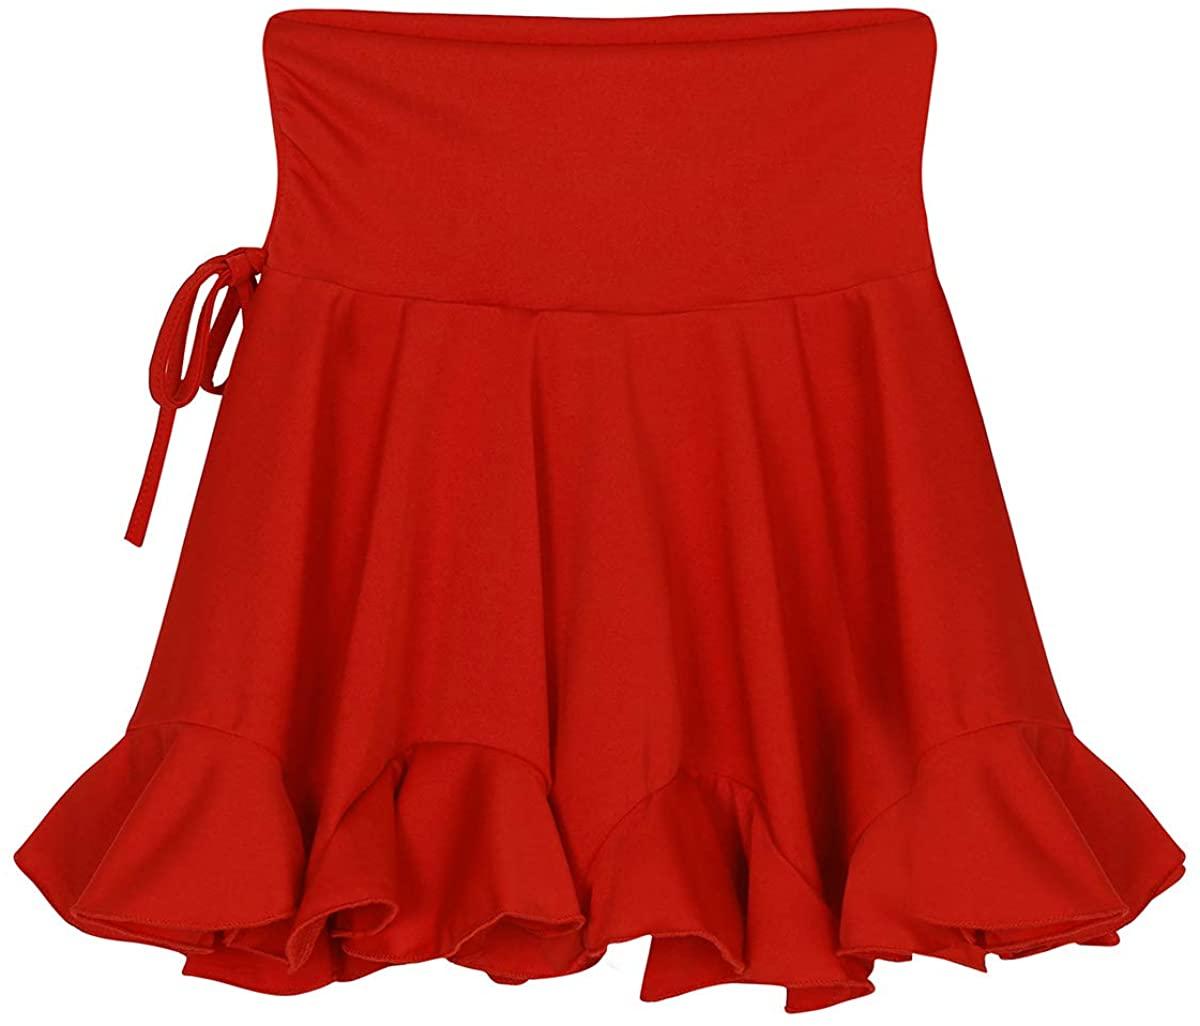 TiaoBug Women's Fashion Latin Dance Skirt Tango Swing Rumba ChaCha Skirt